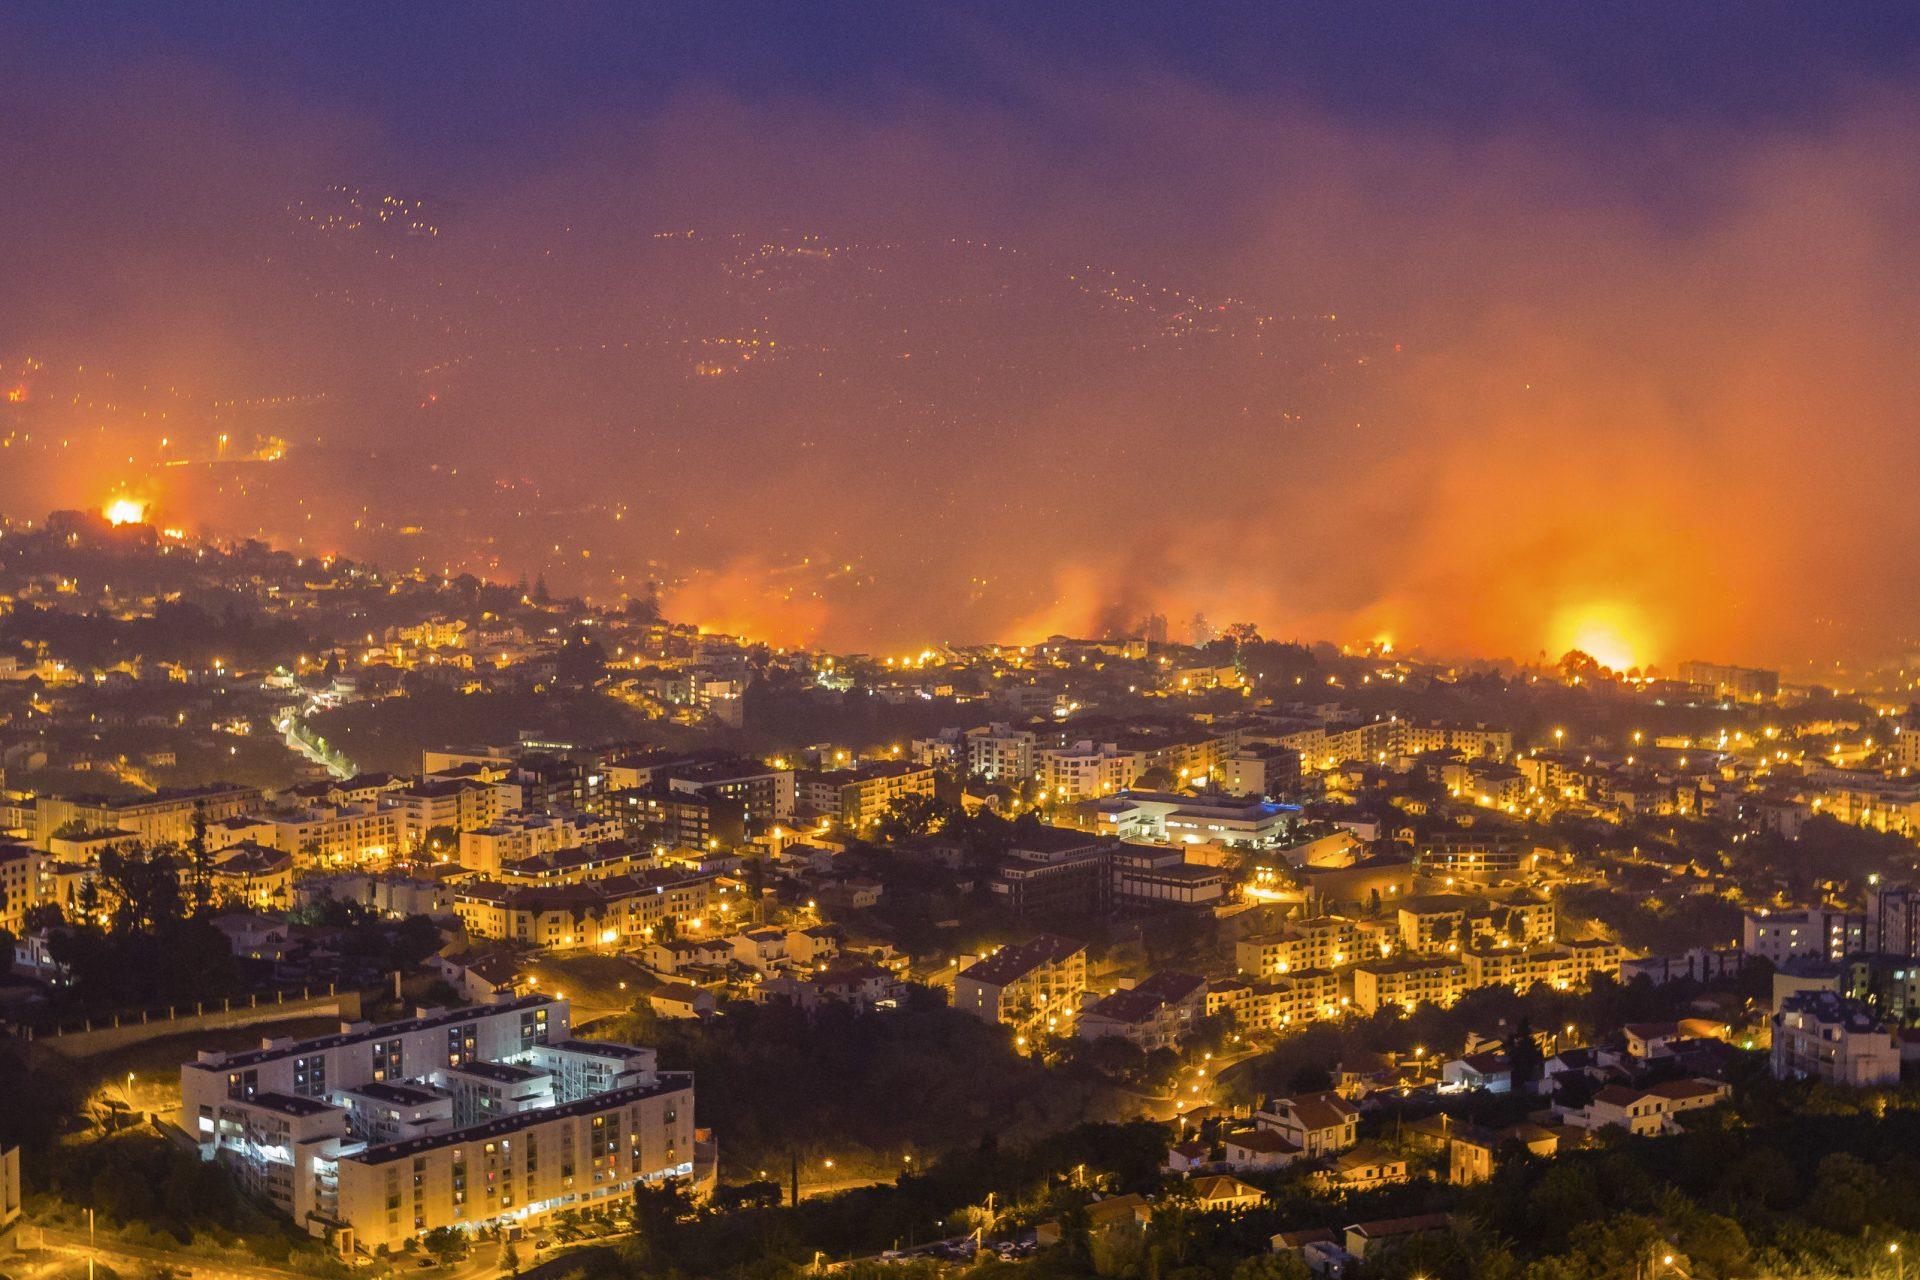 Vista para a cidade do Funchal do miradouro do Pico dos Barcelos, freguesia de São Martinho, Funchal, 09 de Agosto de 2016. GREGÓRIO CUNHA/LUSA